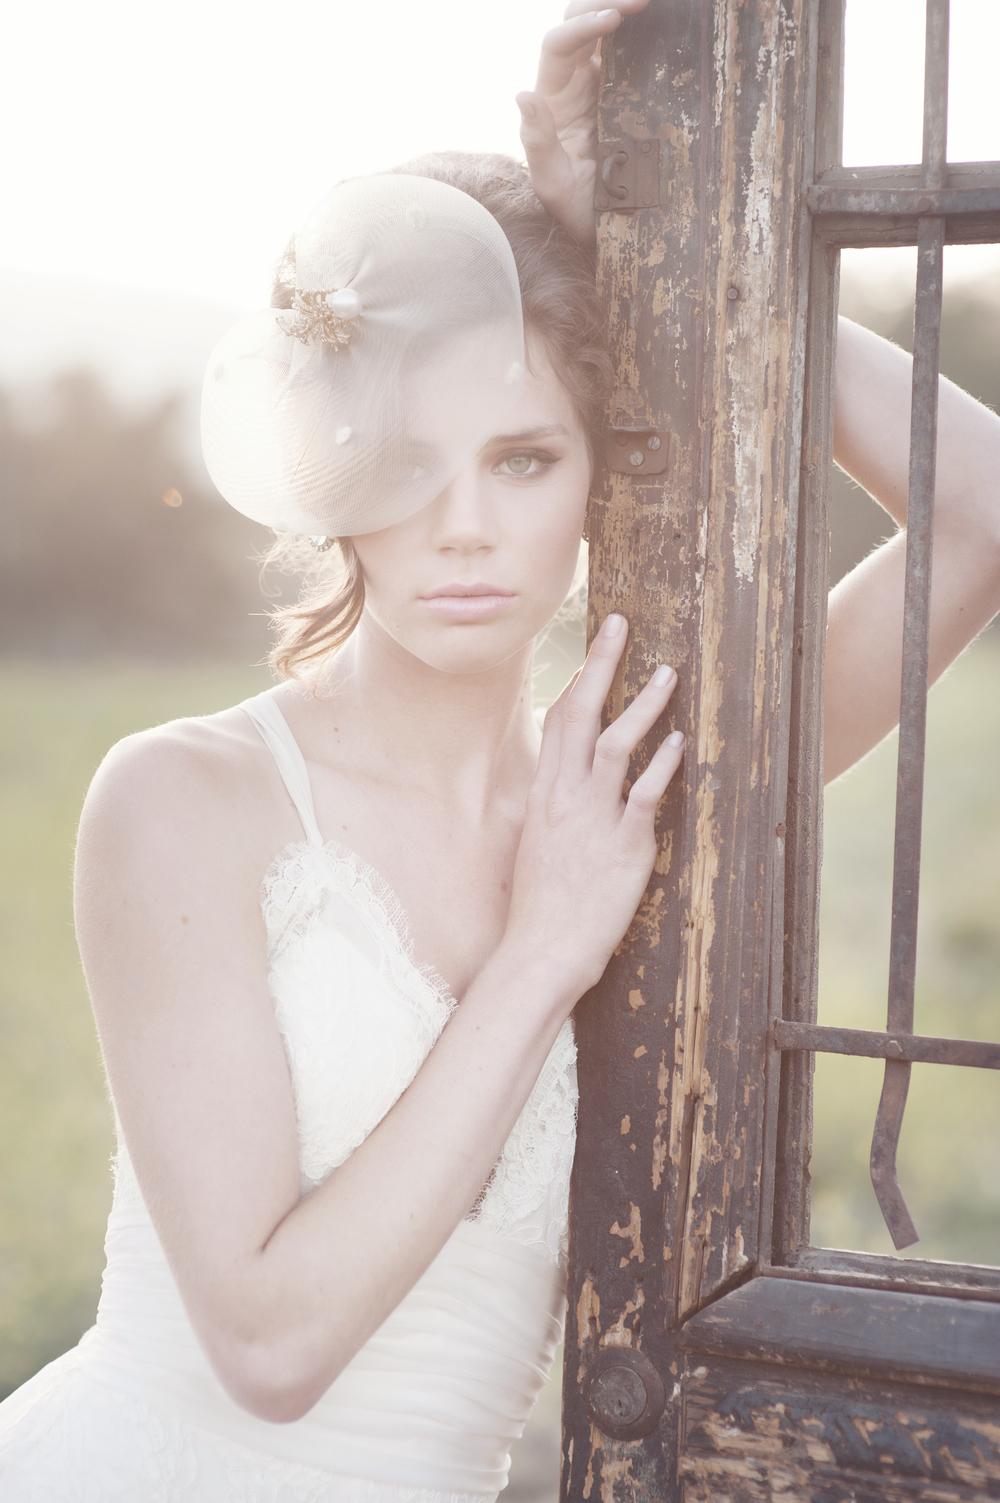 44_AmyMichelson_KLKPhotography.jpg